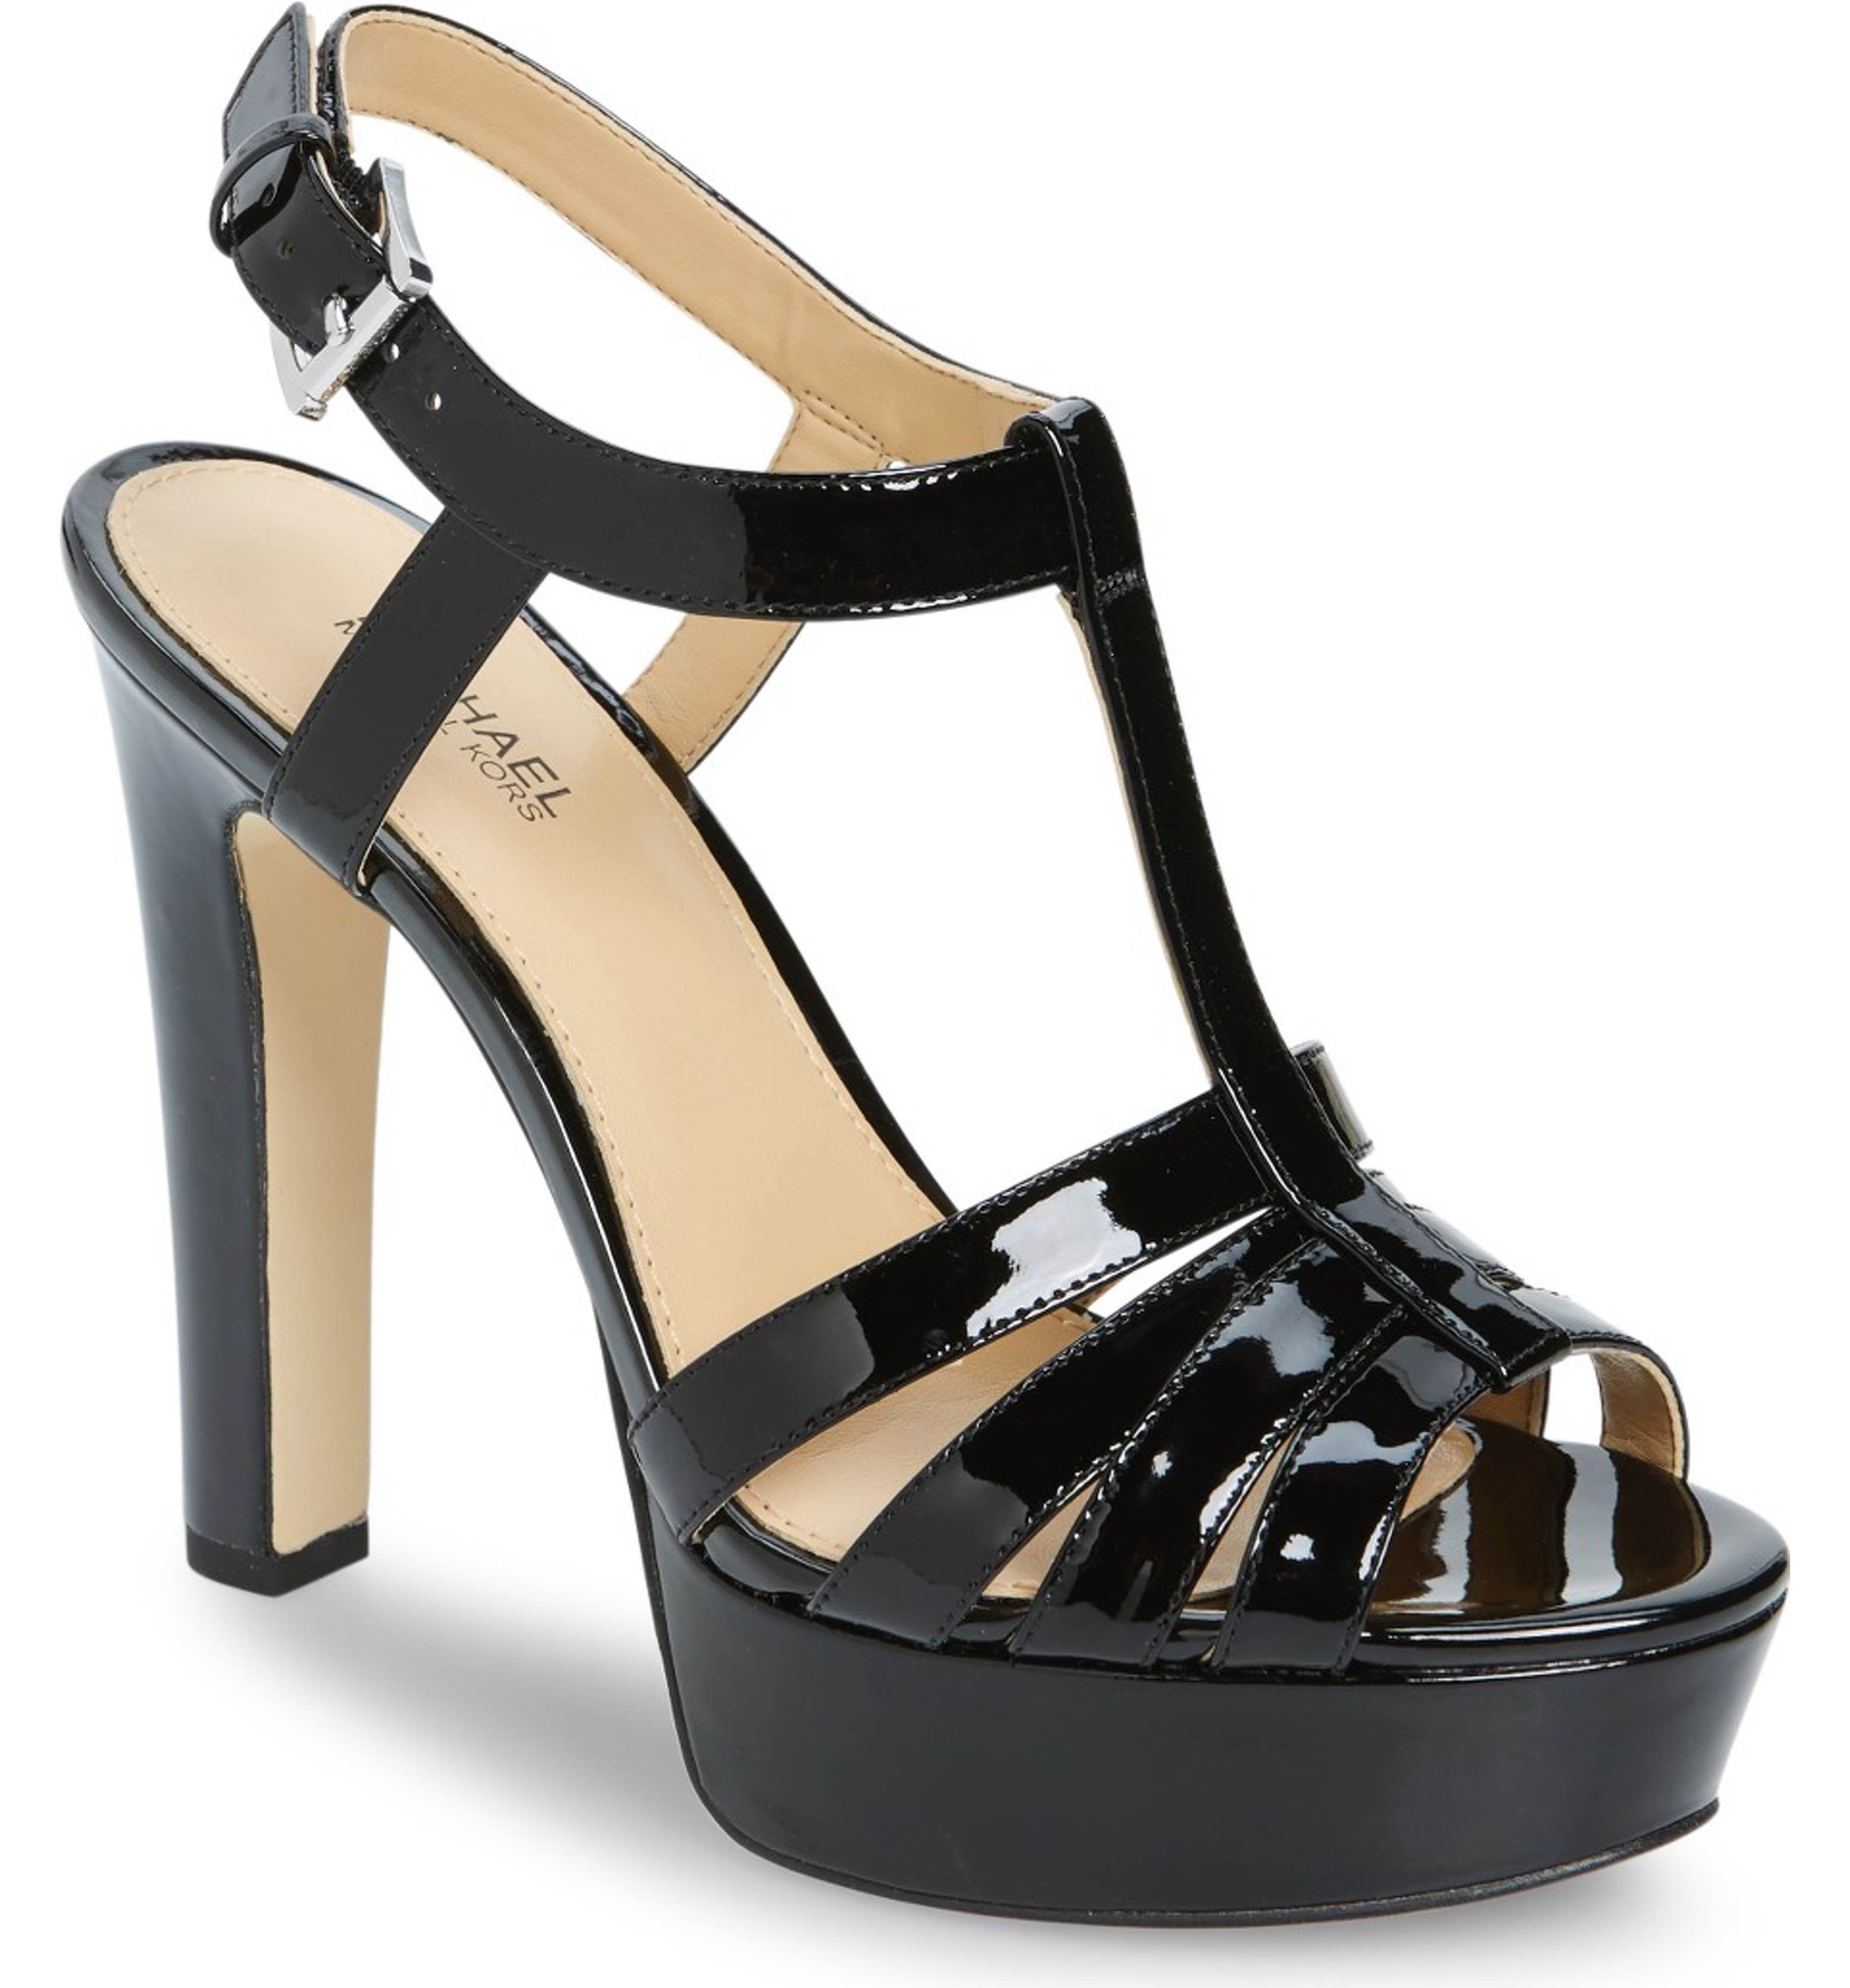 66795c3aaa6 Main Image - MICHAEL Michael Kors Catalina Platform Sandal (Women ...